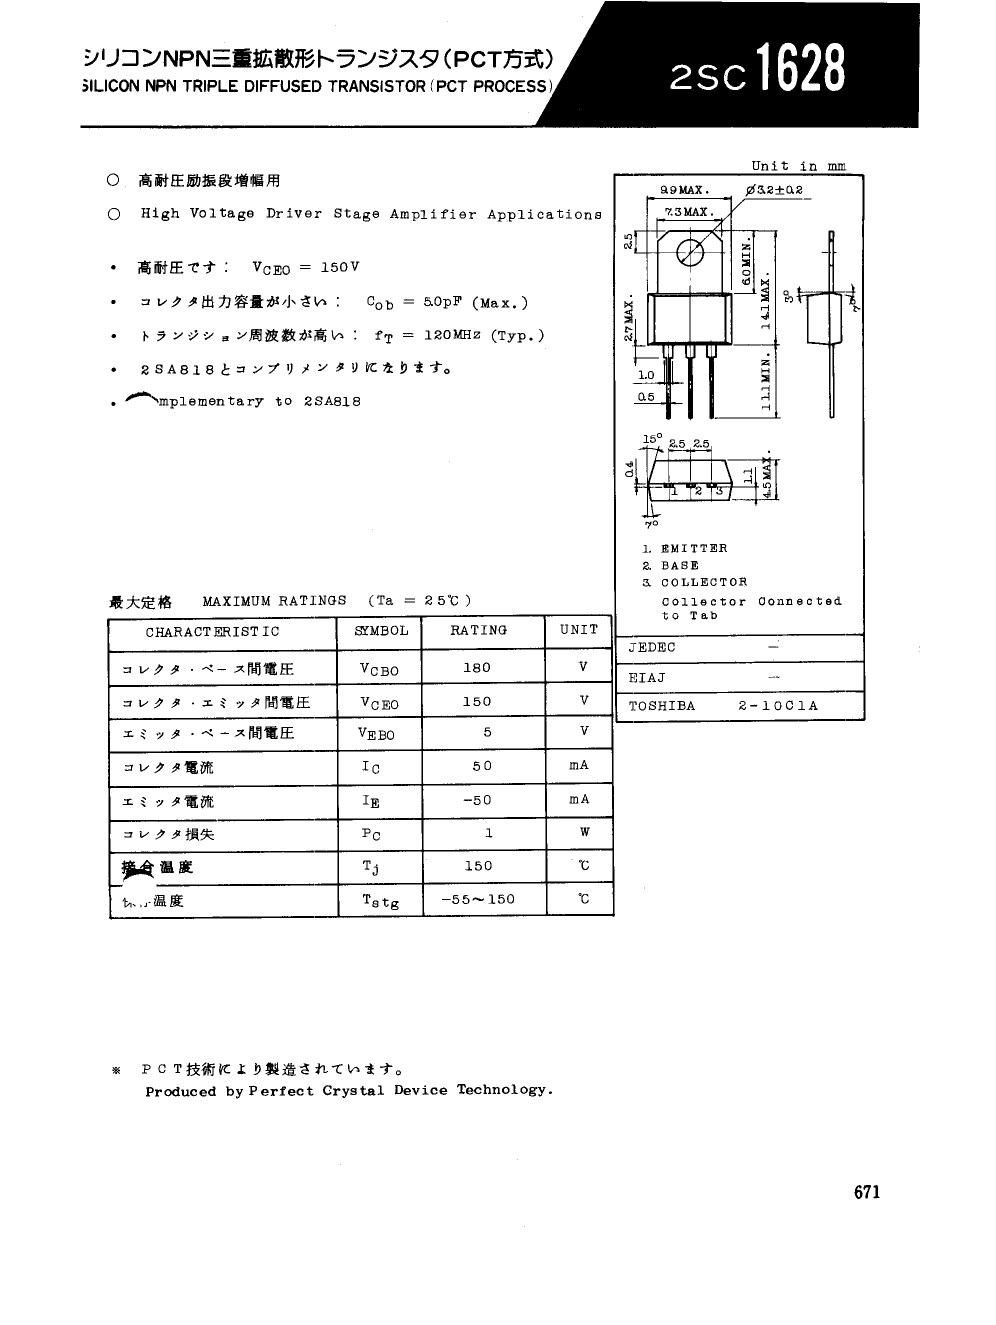 2SC1628 datasheet